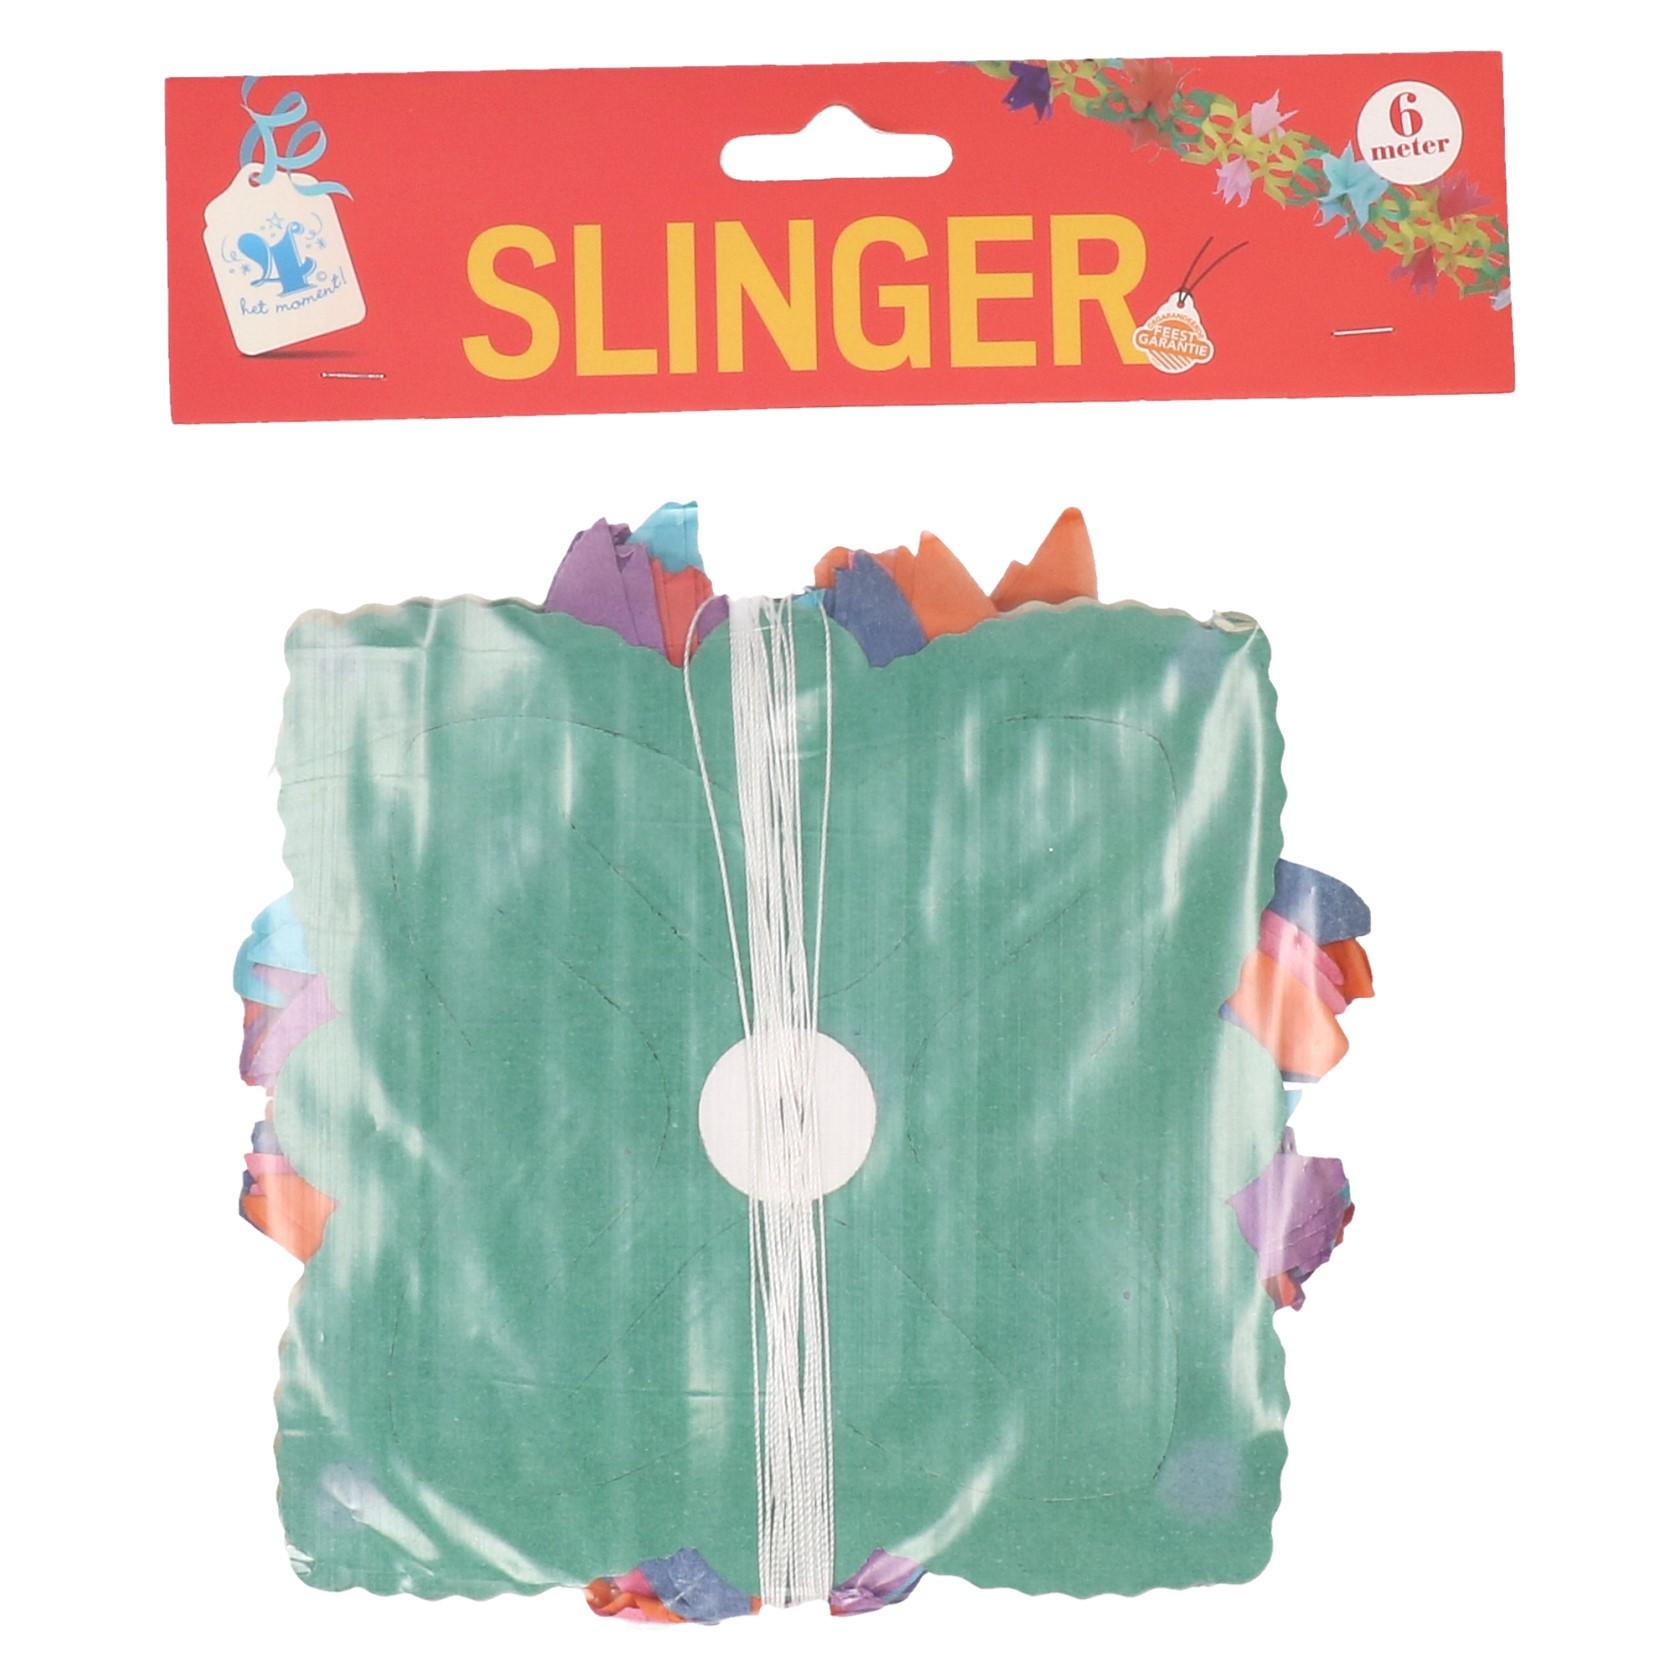 "Slinger ""bloem"" 6 meter"